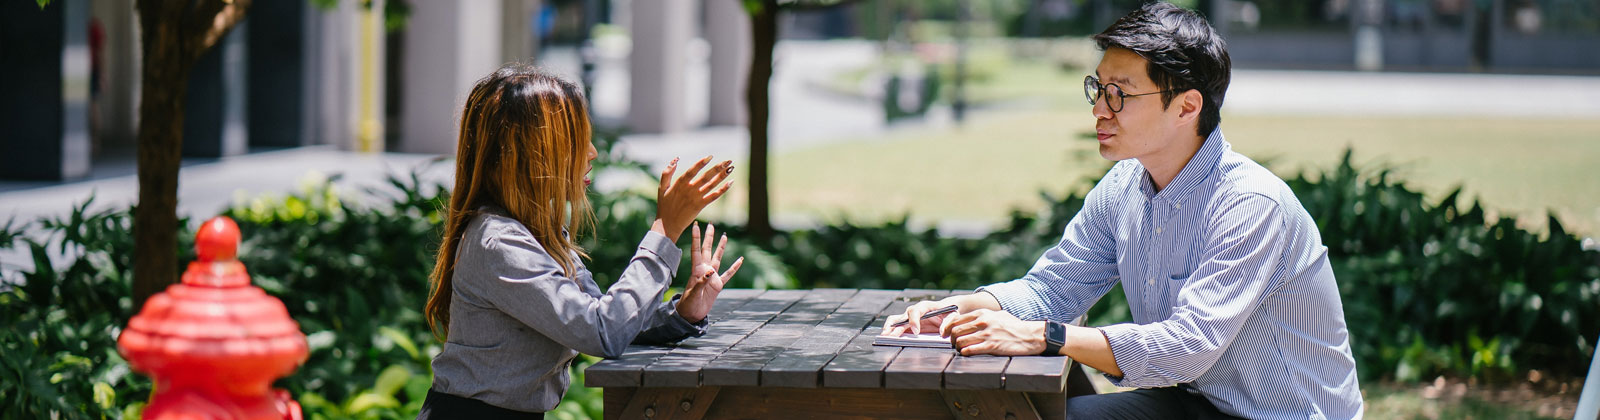 Outdoor conversation